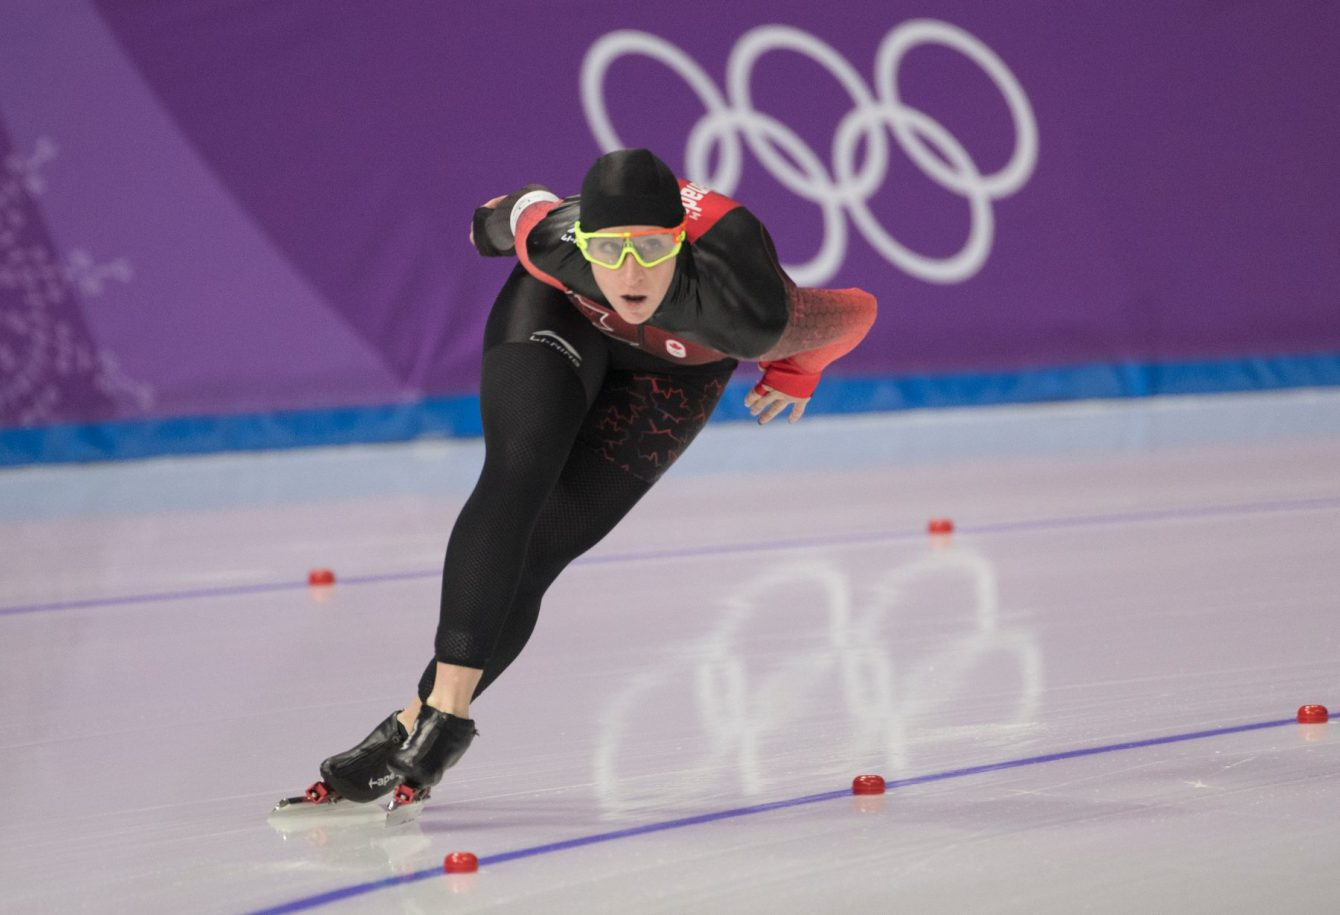 Team Canada Ivanie Blondin PyeongChang 2018 5000m